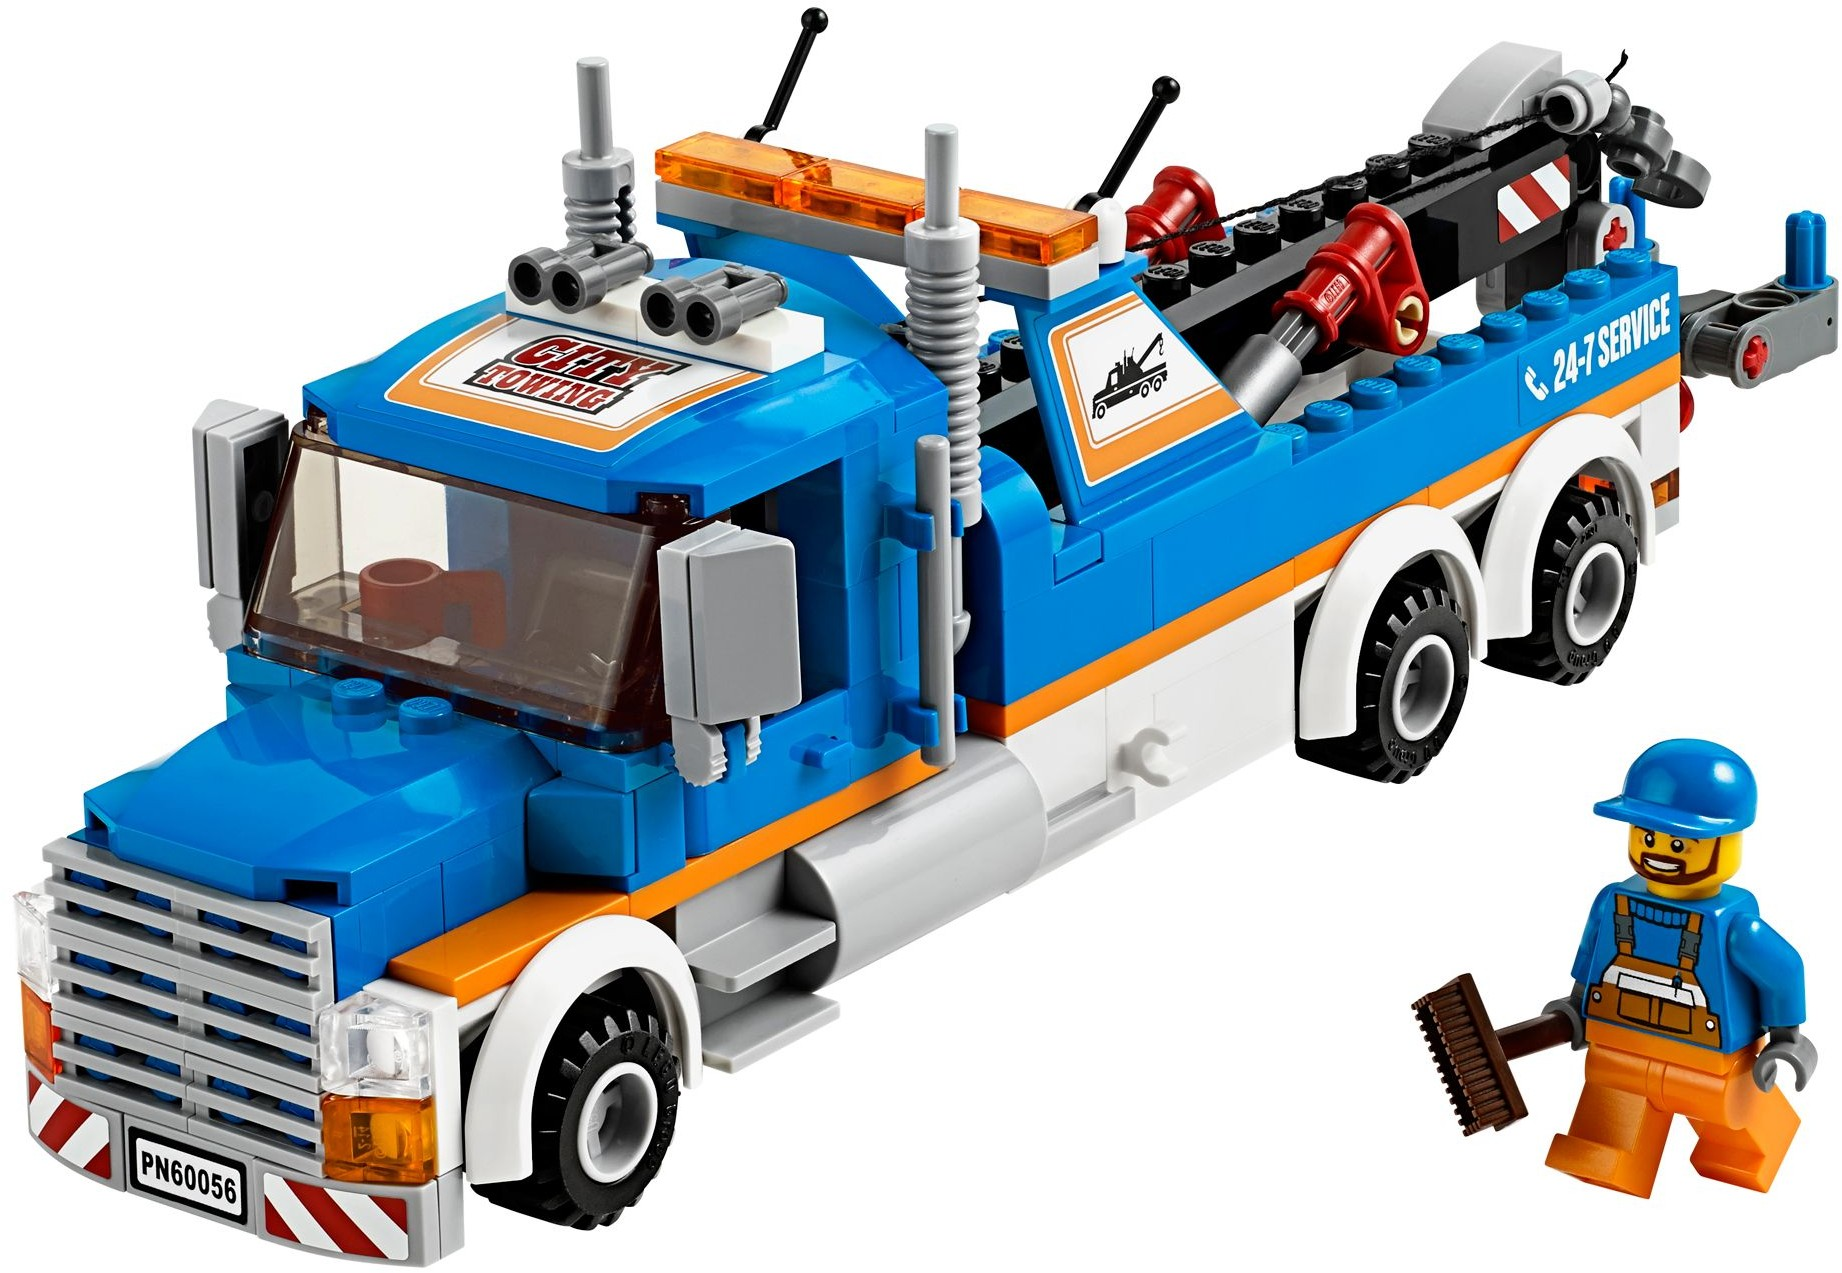 City Tagged 24 7 Service Brickset Lego Set Guide And Database